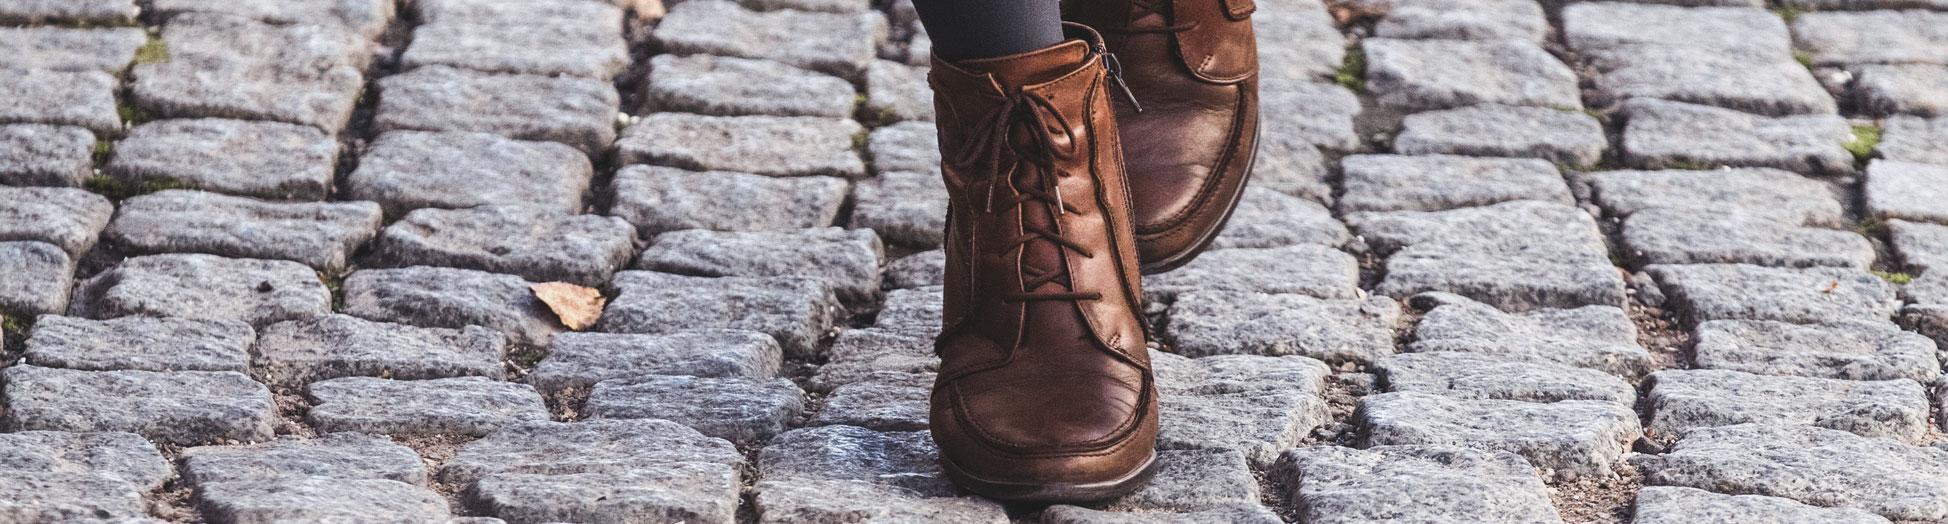 Schmal Schuhe